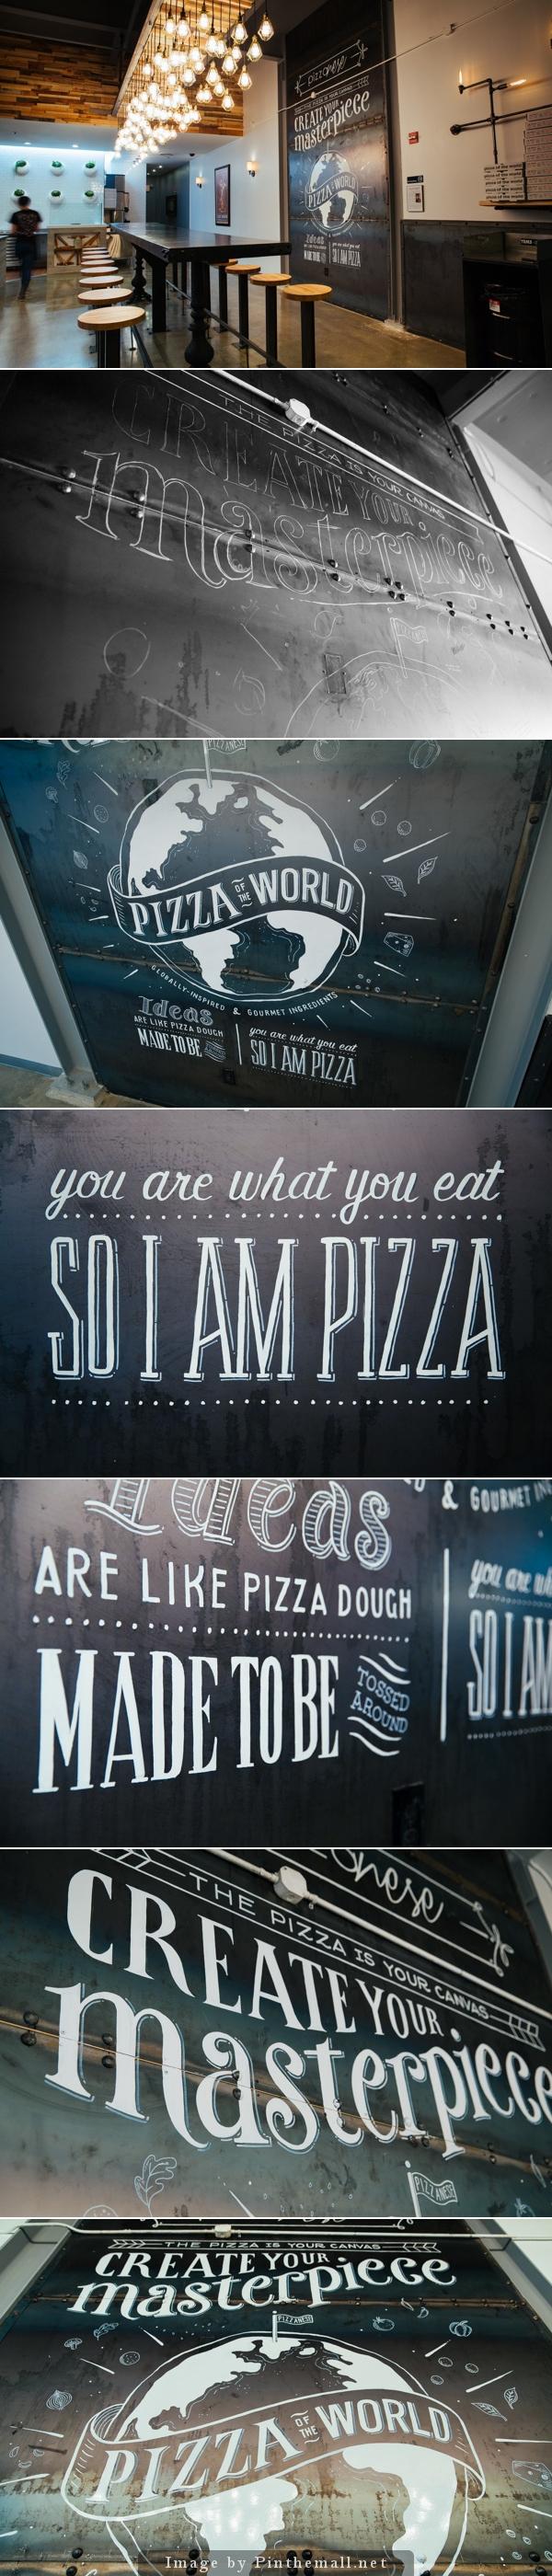 lettering and illustration mural for pizzanese street. Black Bedroom Furniture Sets. Home Design Ideas